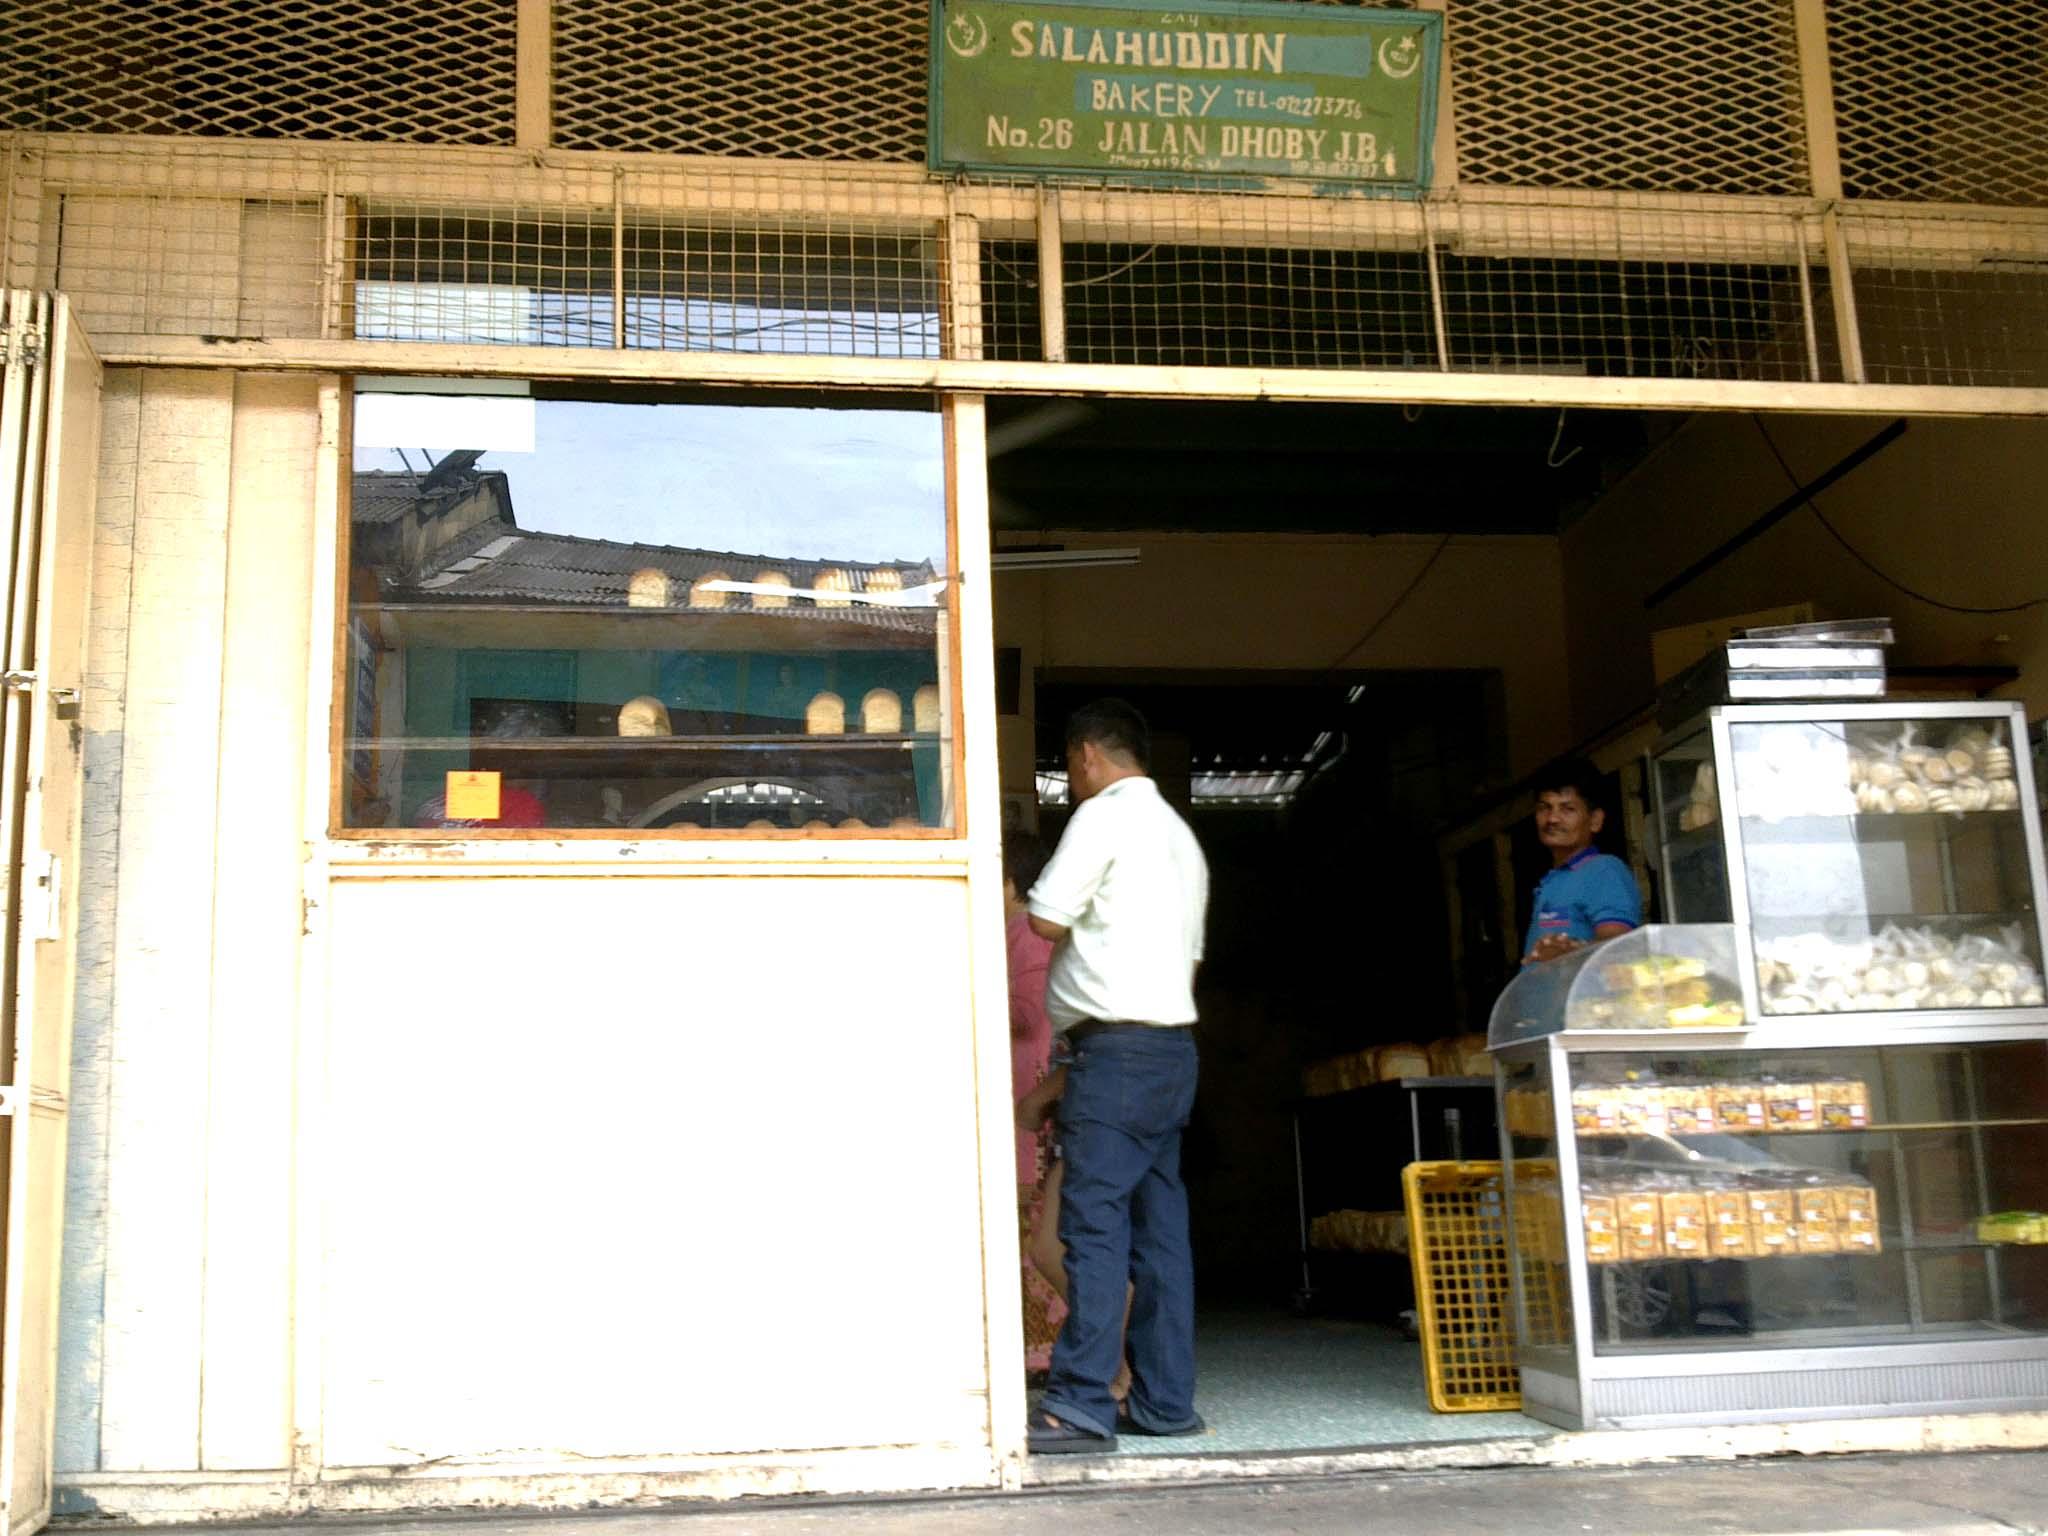 Kedai Roti Salahuddin (Salahuddin bakery) Jalan Dhoby